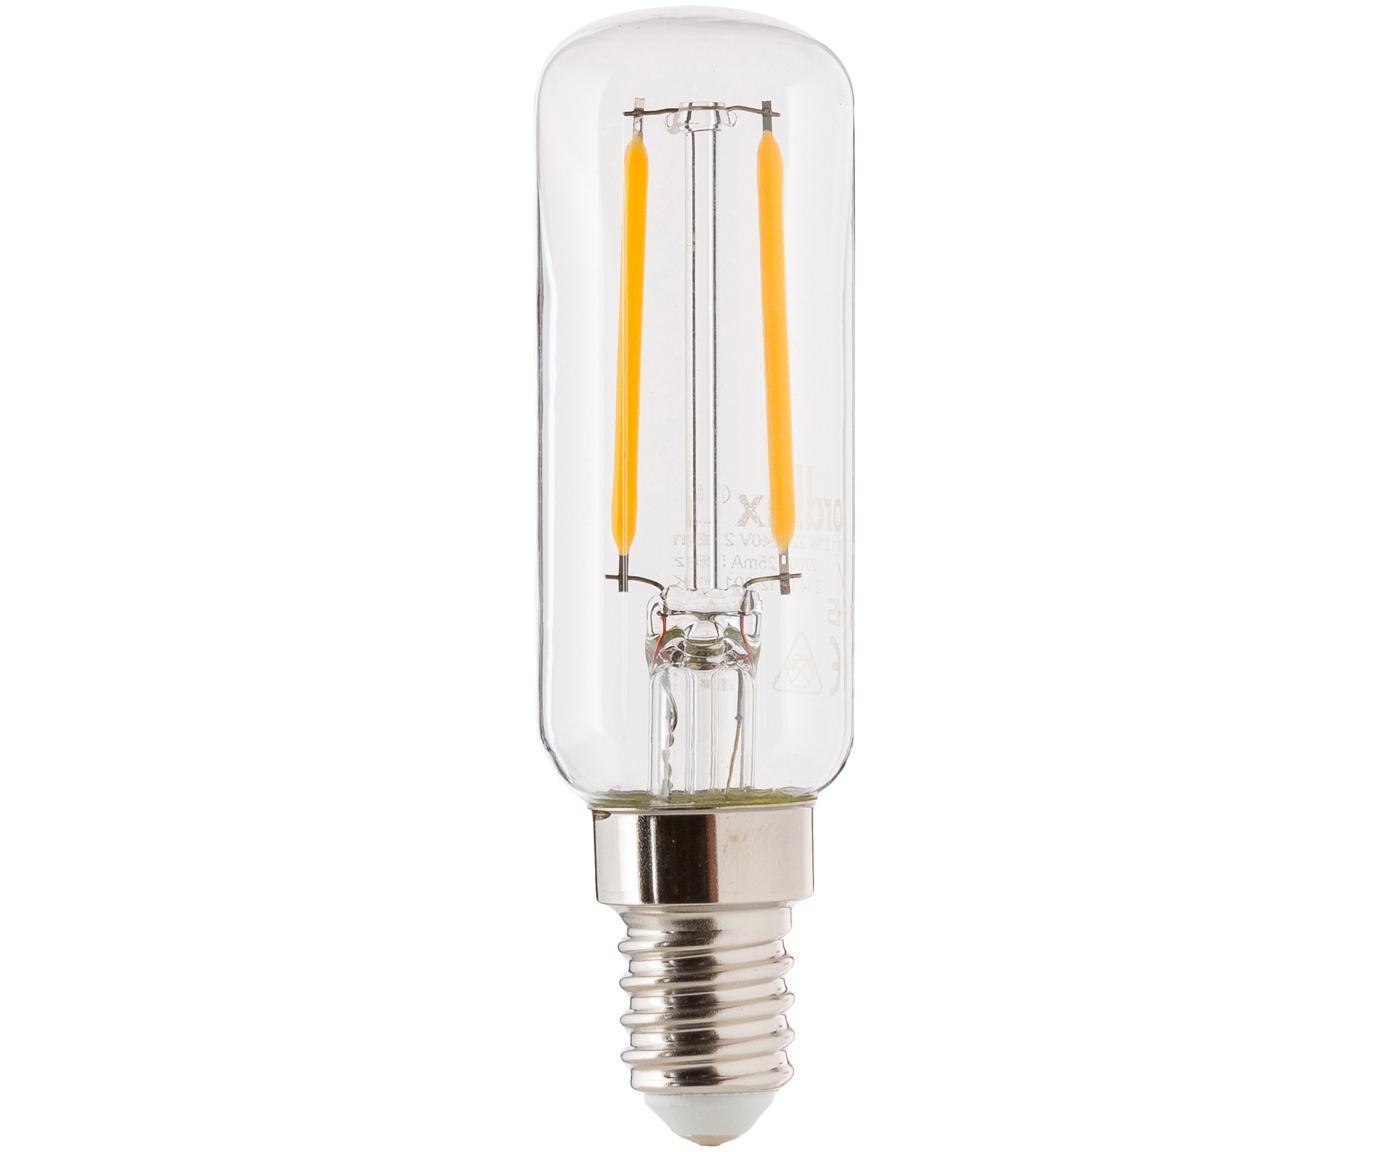 Lampadina a LED Yura (E14 / 2Watt), Lampadina: vetro, Trasparente, Ø 3 x Alt. 9 cm